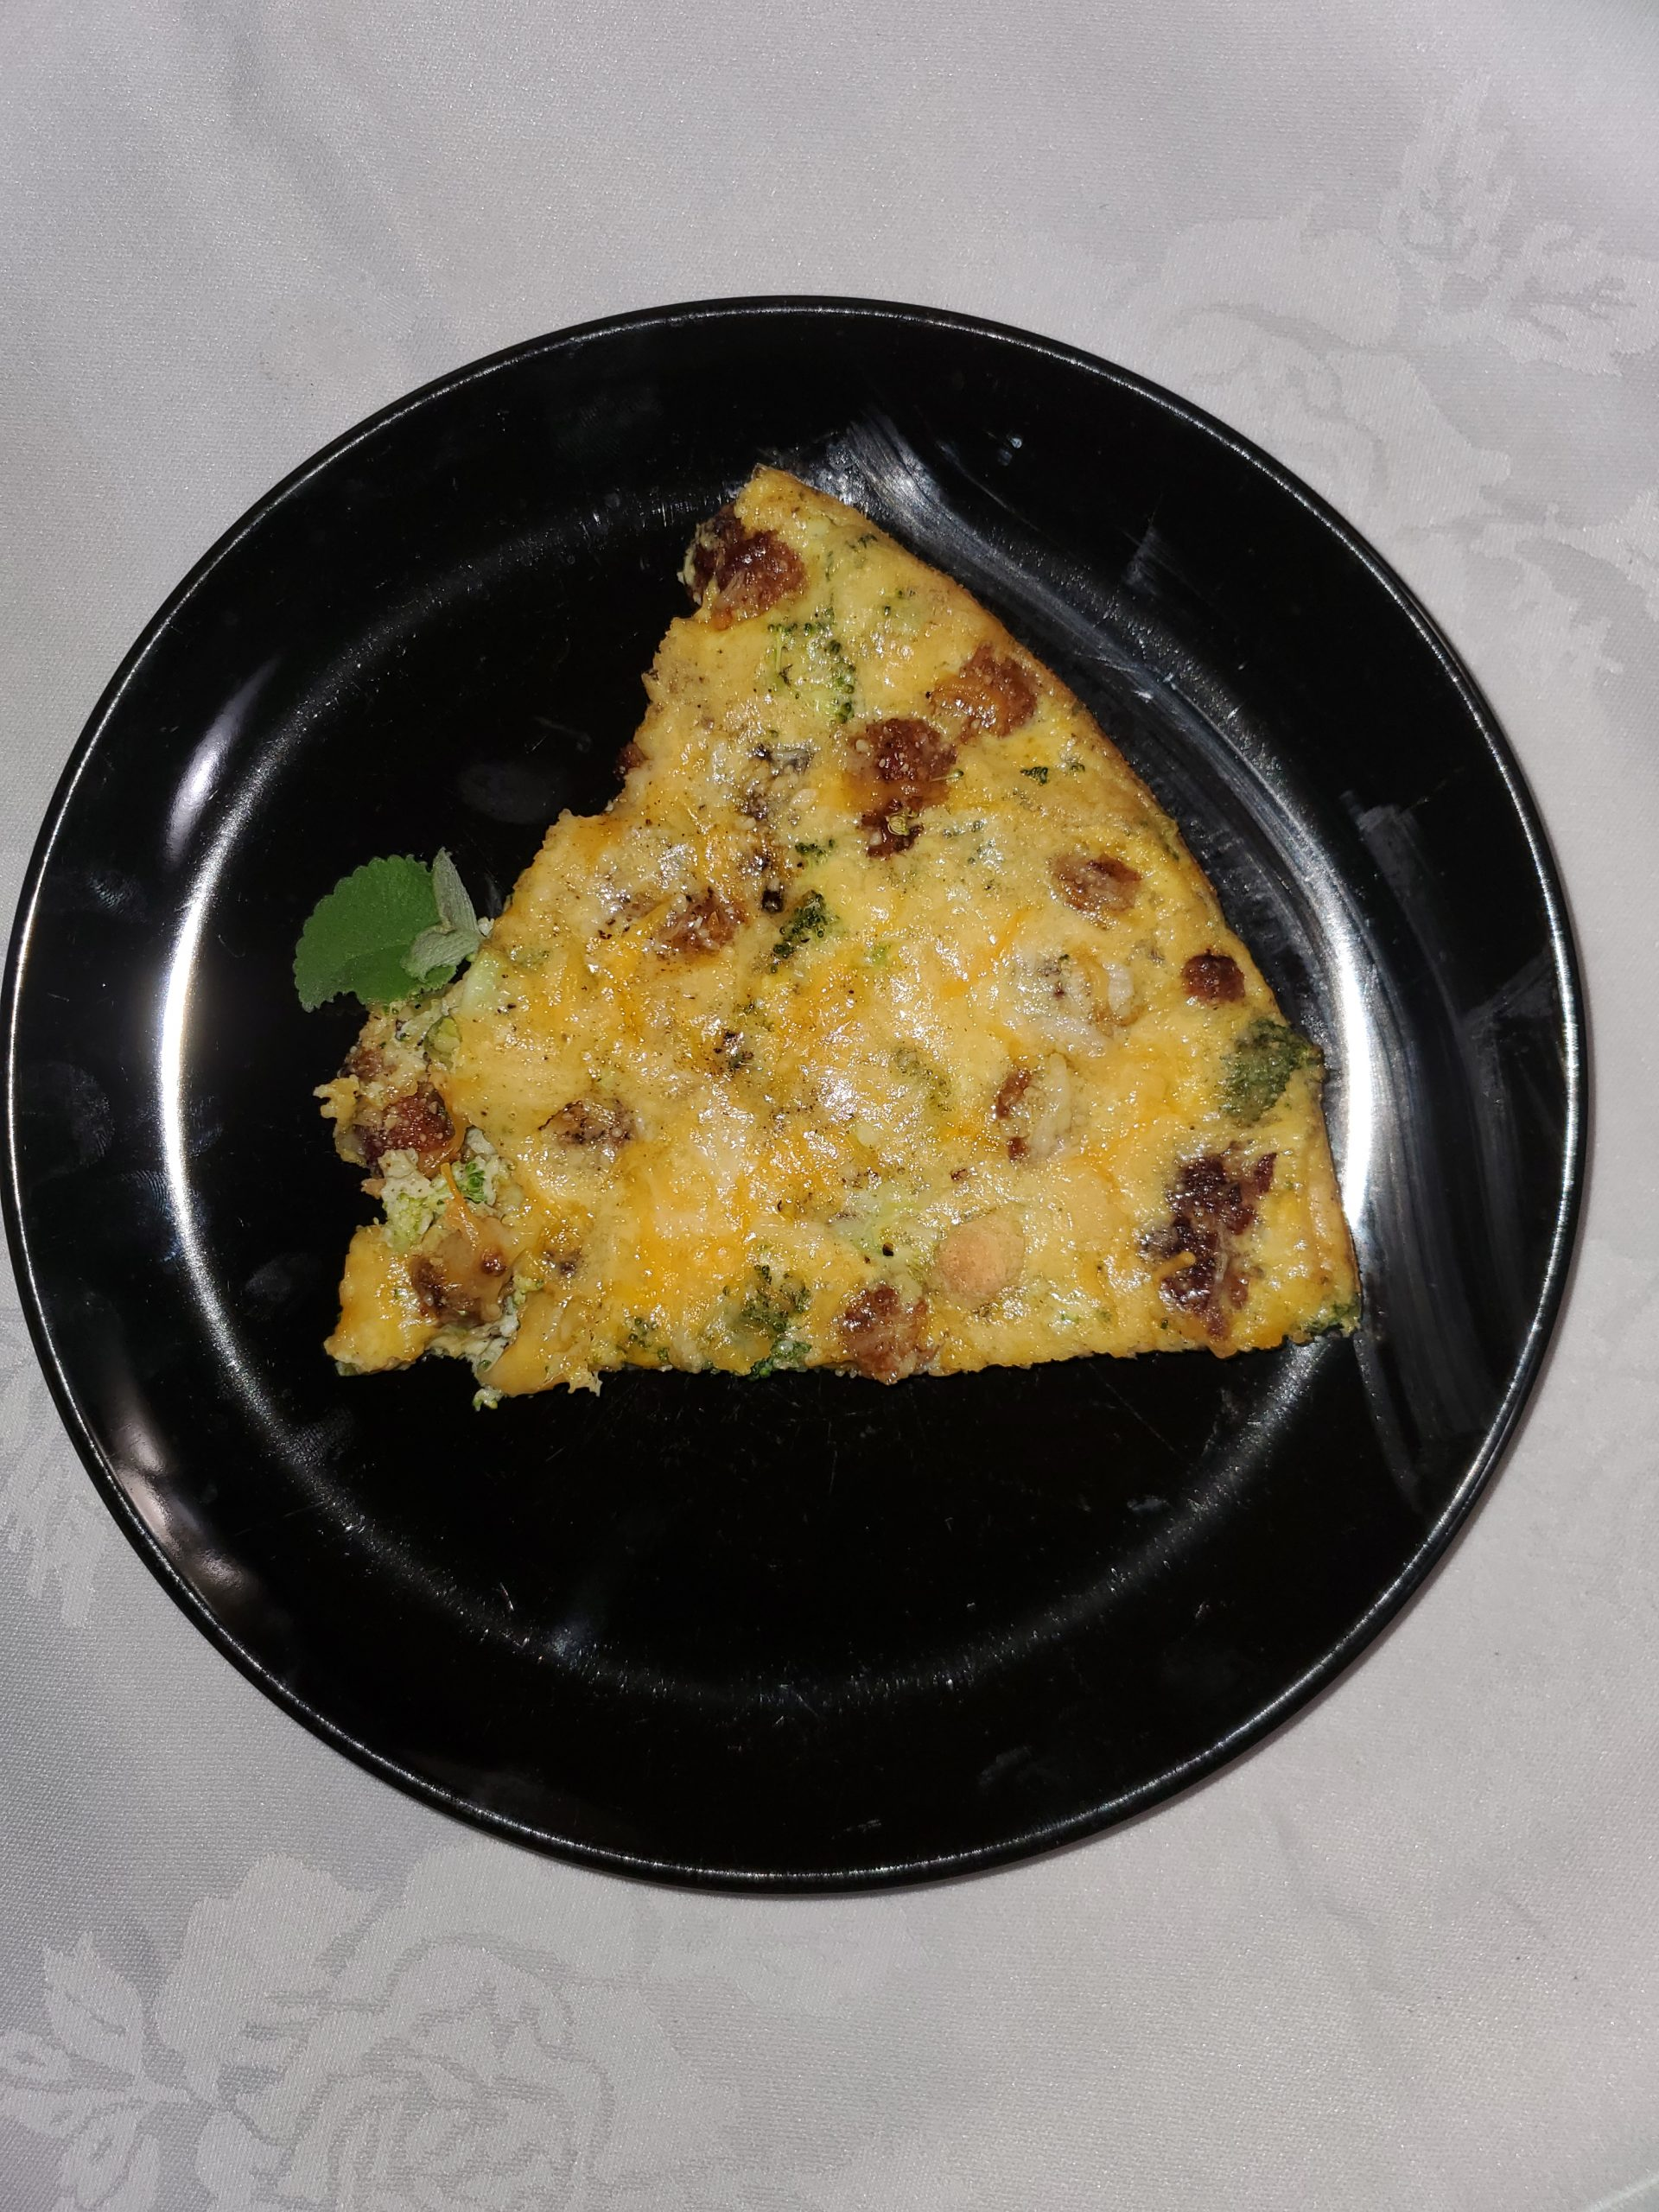 Keto-Diet is a popular fad diet trend. This Breakfast Italian Sausage Quiche is